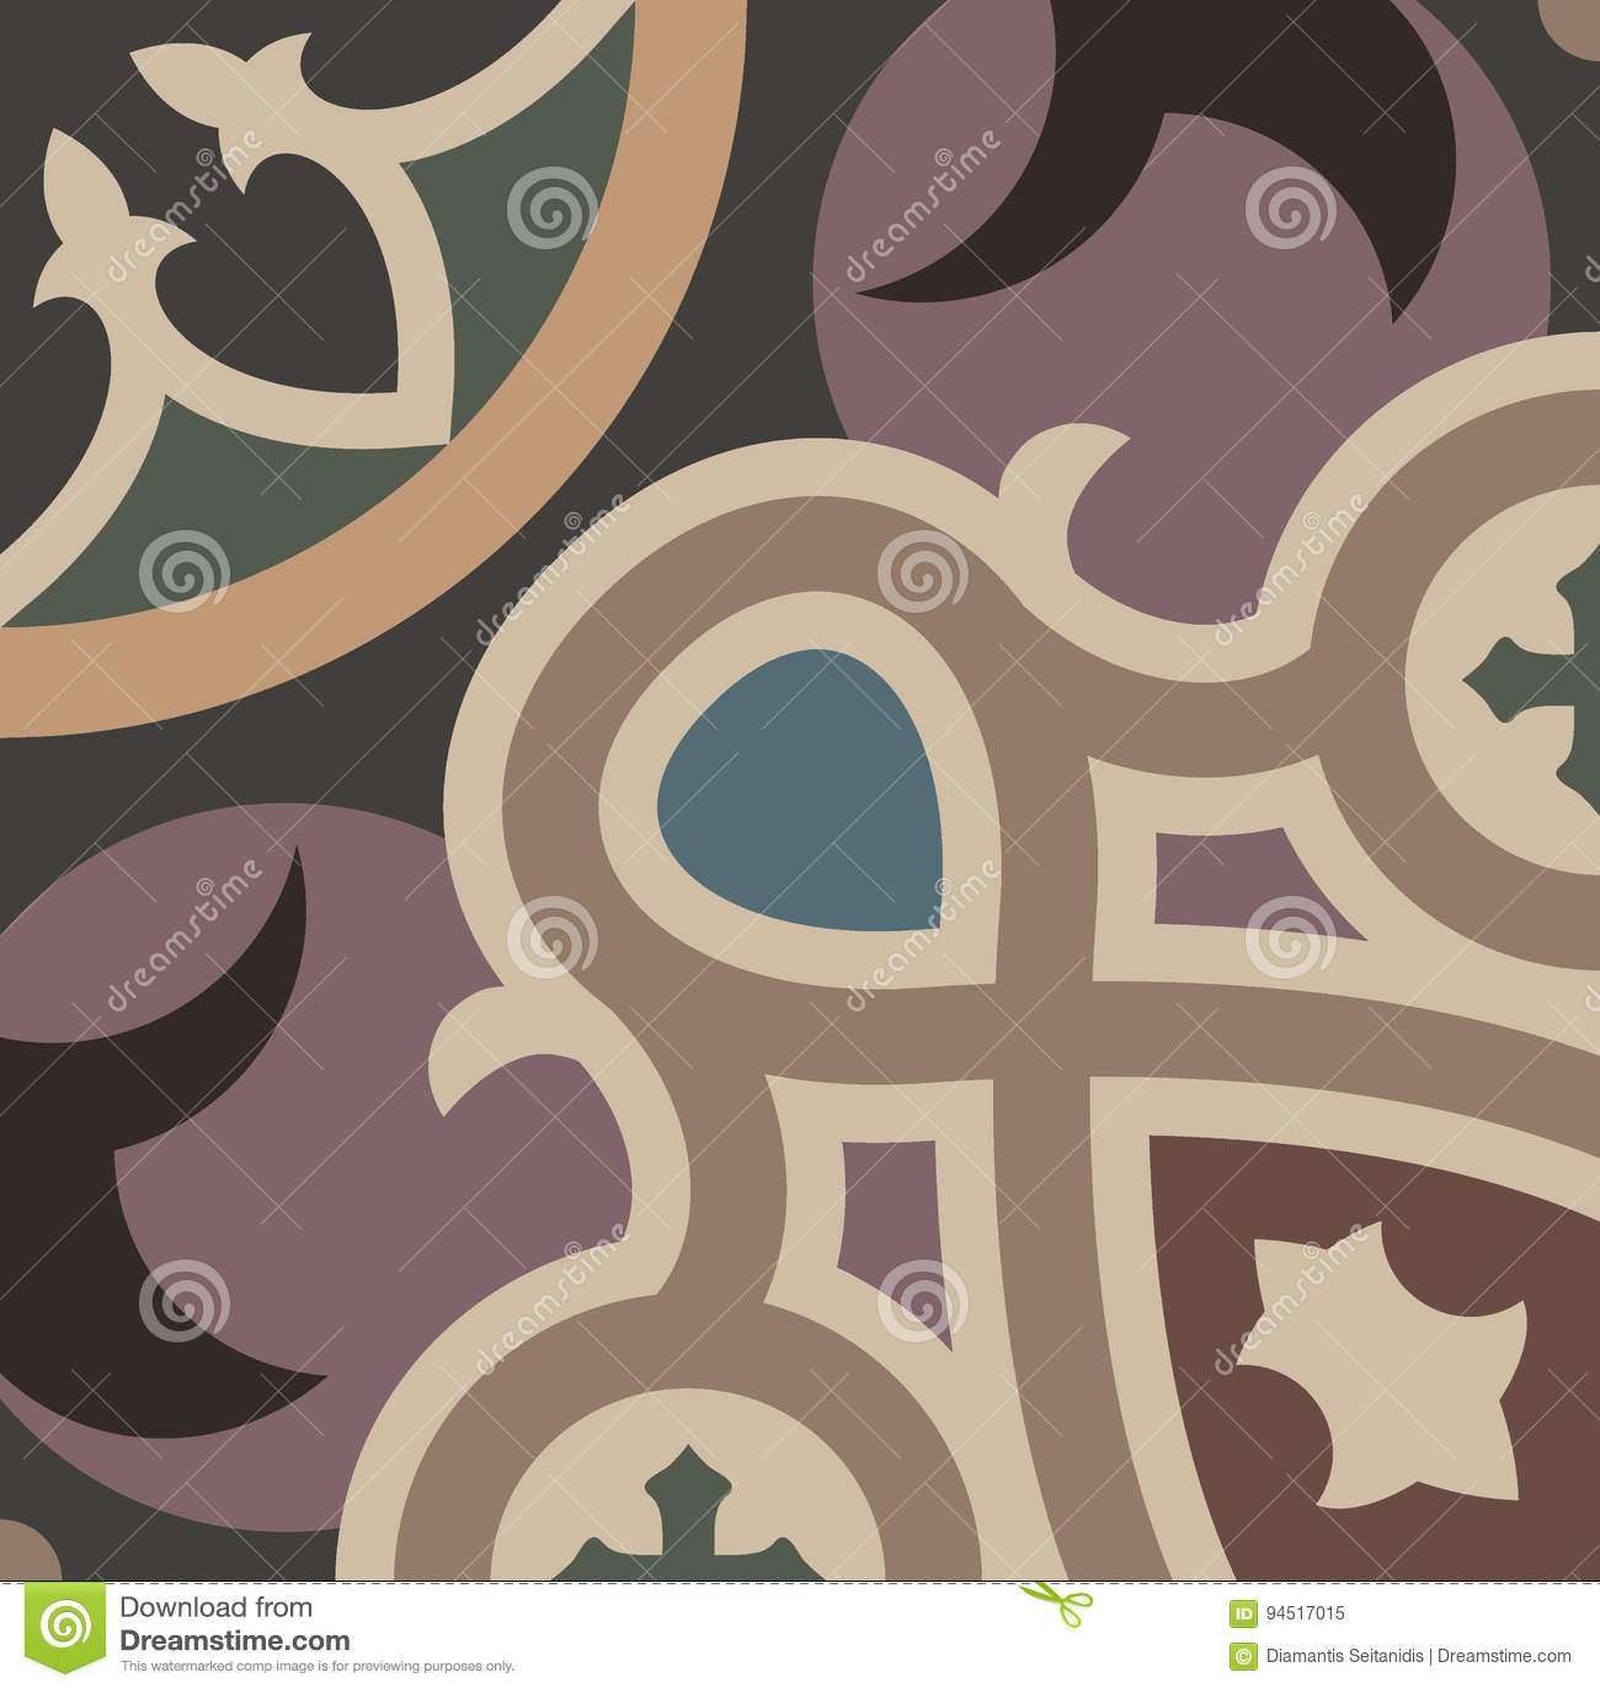 hydraulic vintage cement tiles stock vector illustration of italian decoration 94517015